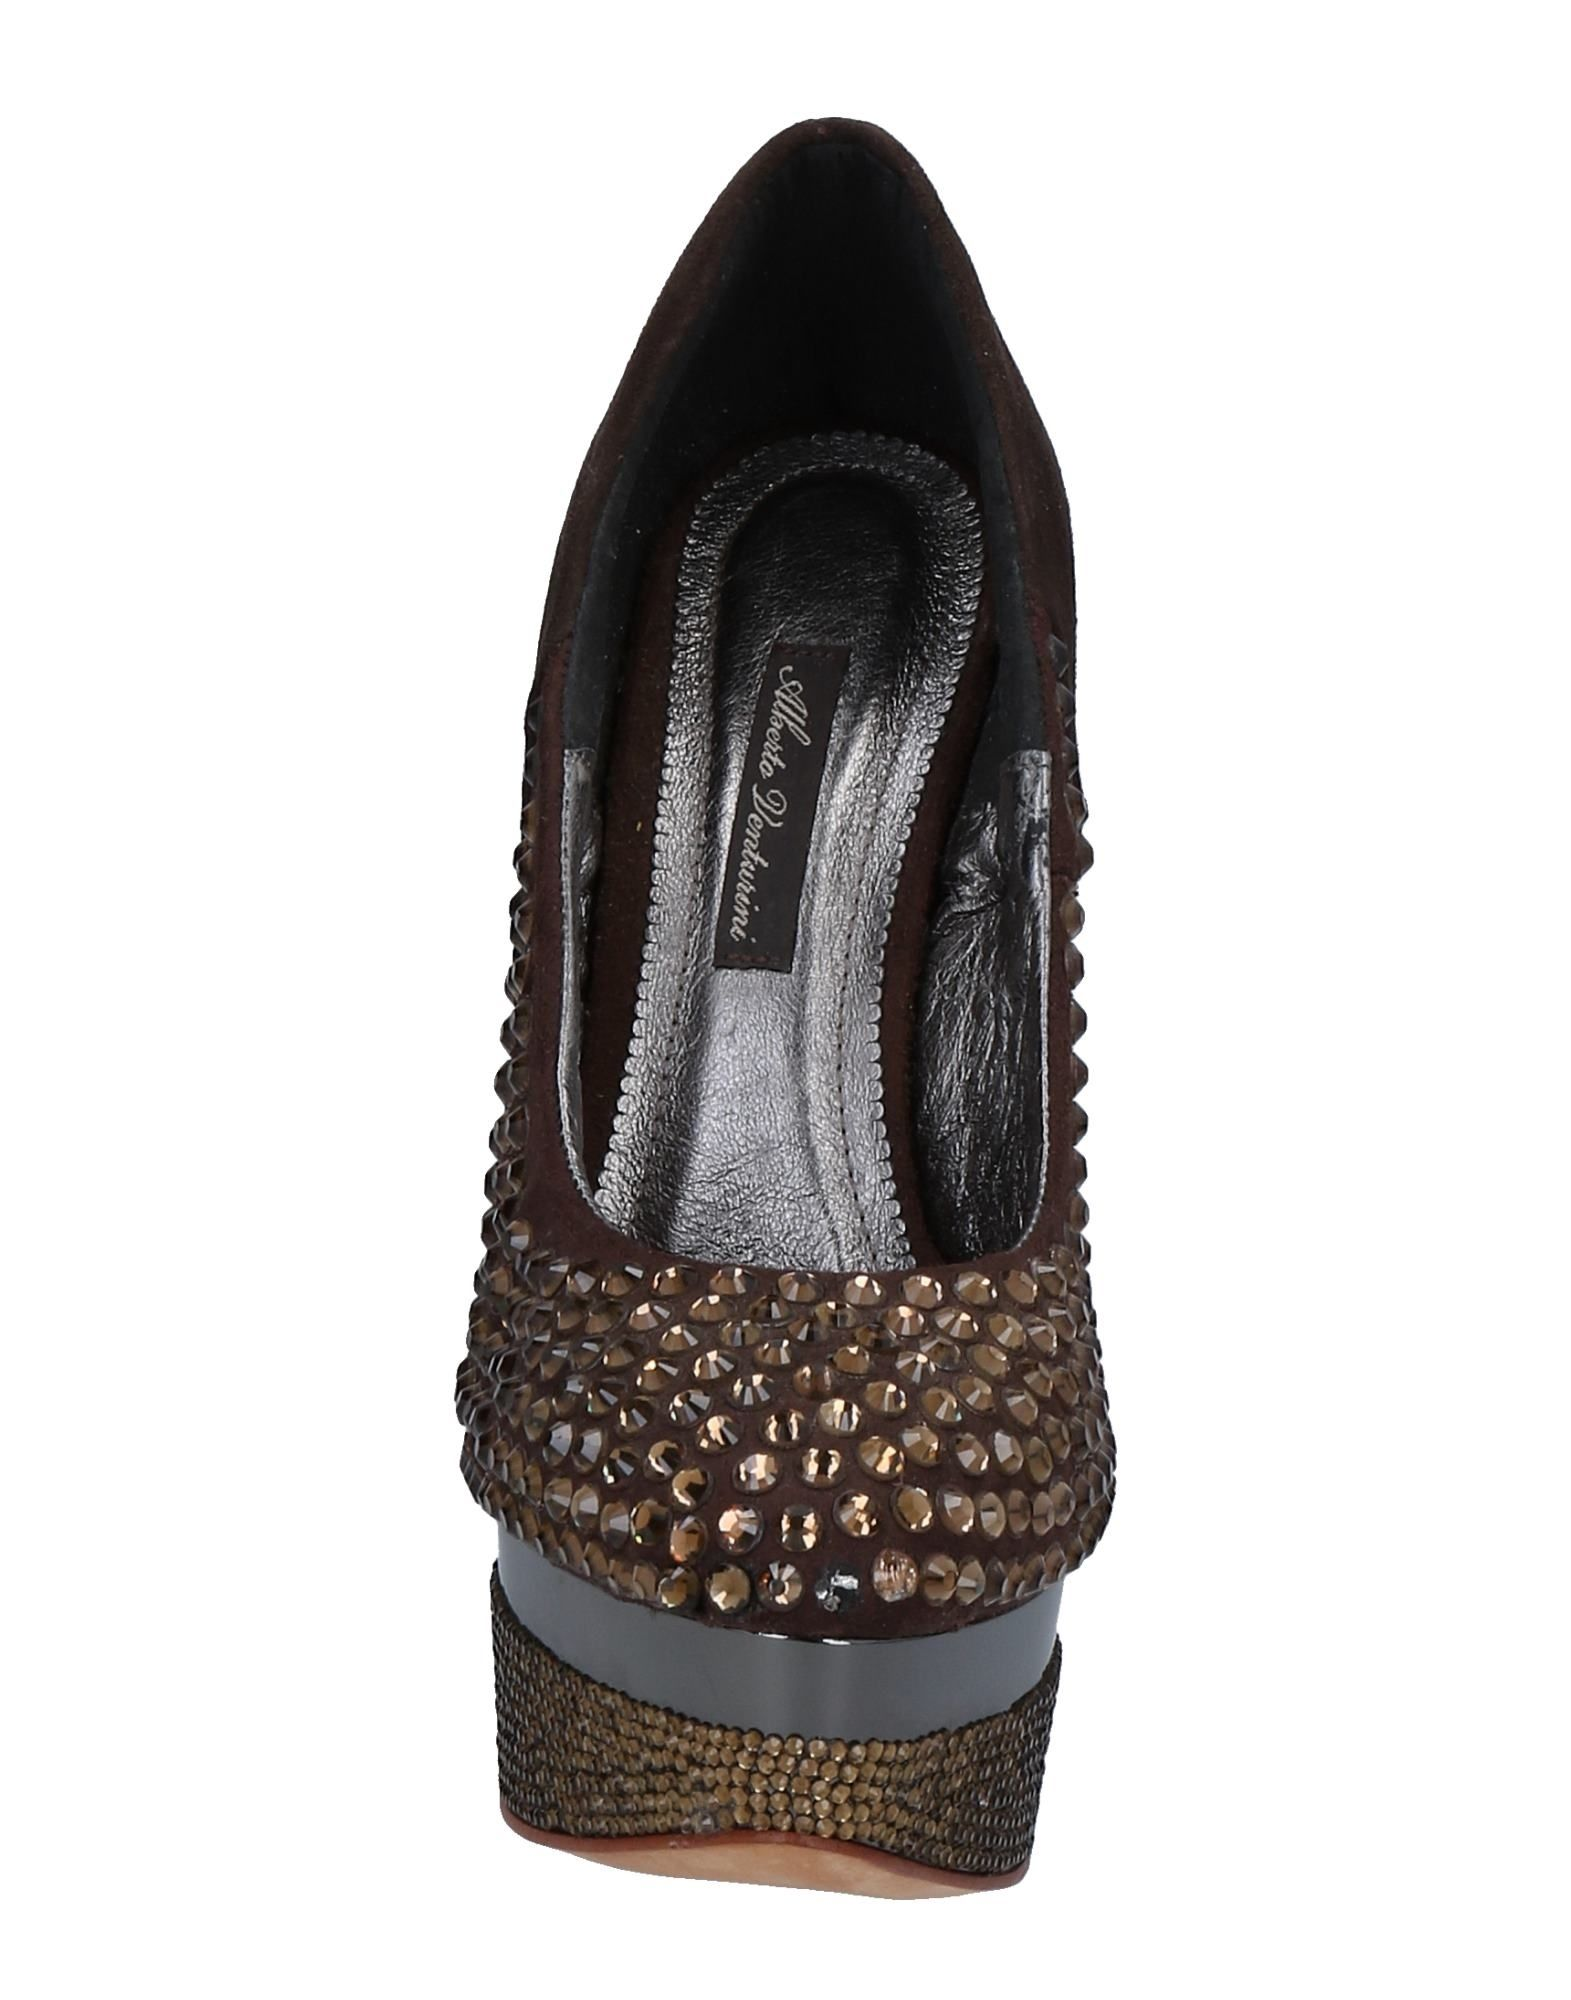 Stilvolle billige Pumps Schuhe Alberto Venturini Pumps billige Damen  11483099SL 97f1c7